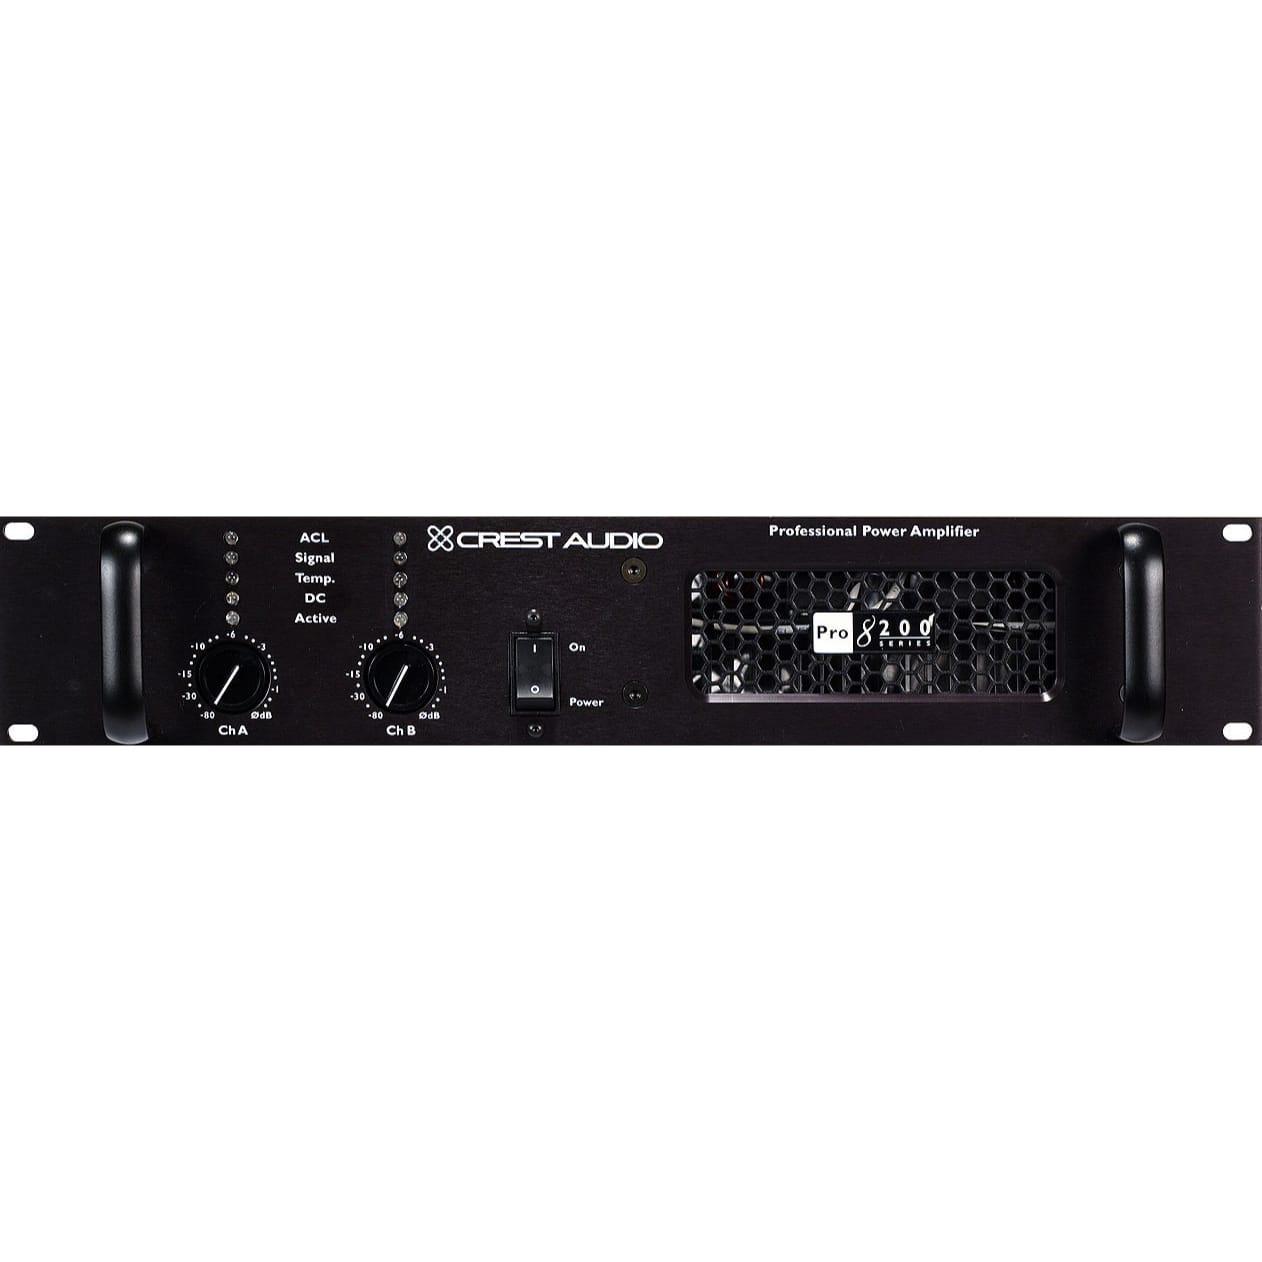 Crest Audio Pro 8200 - 825W @ 8 Ohms stereo amplifier.